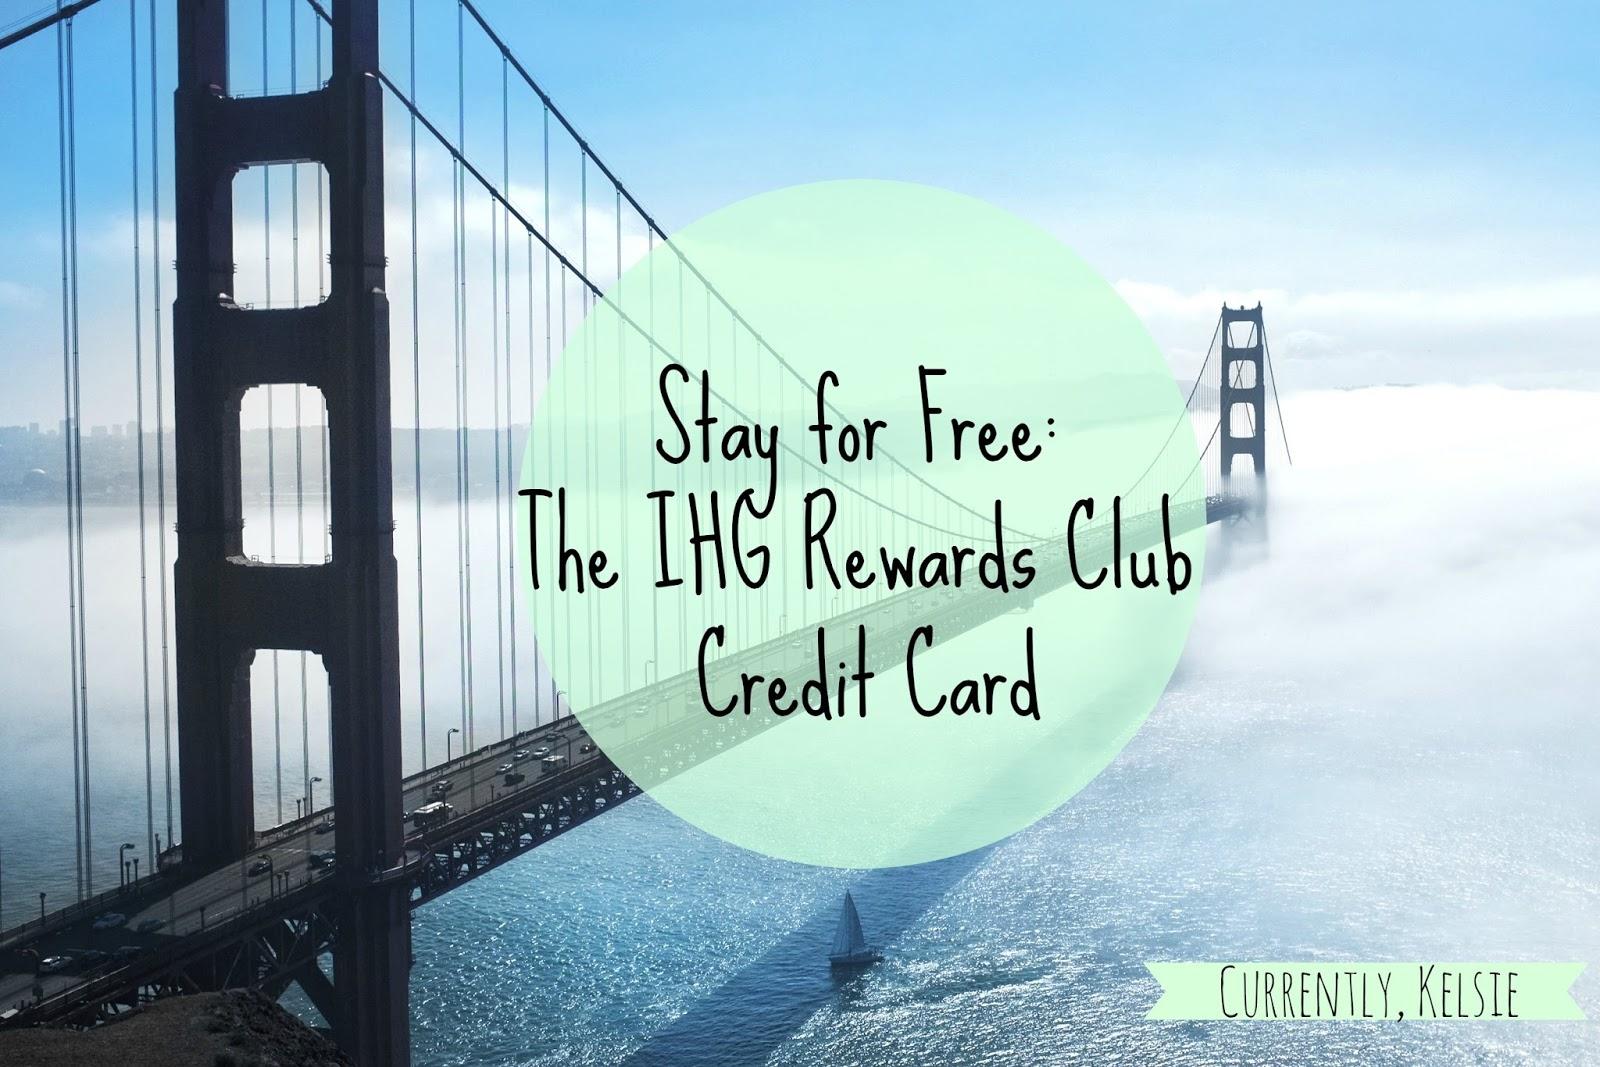 The IHG Rewards Club Credit Card: Stay for Free ~ Currently